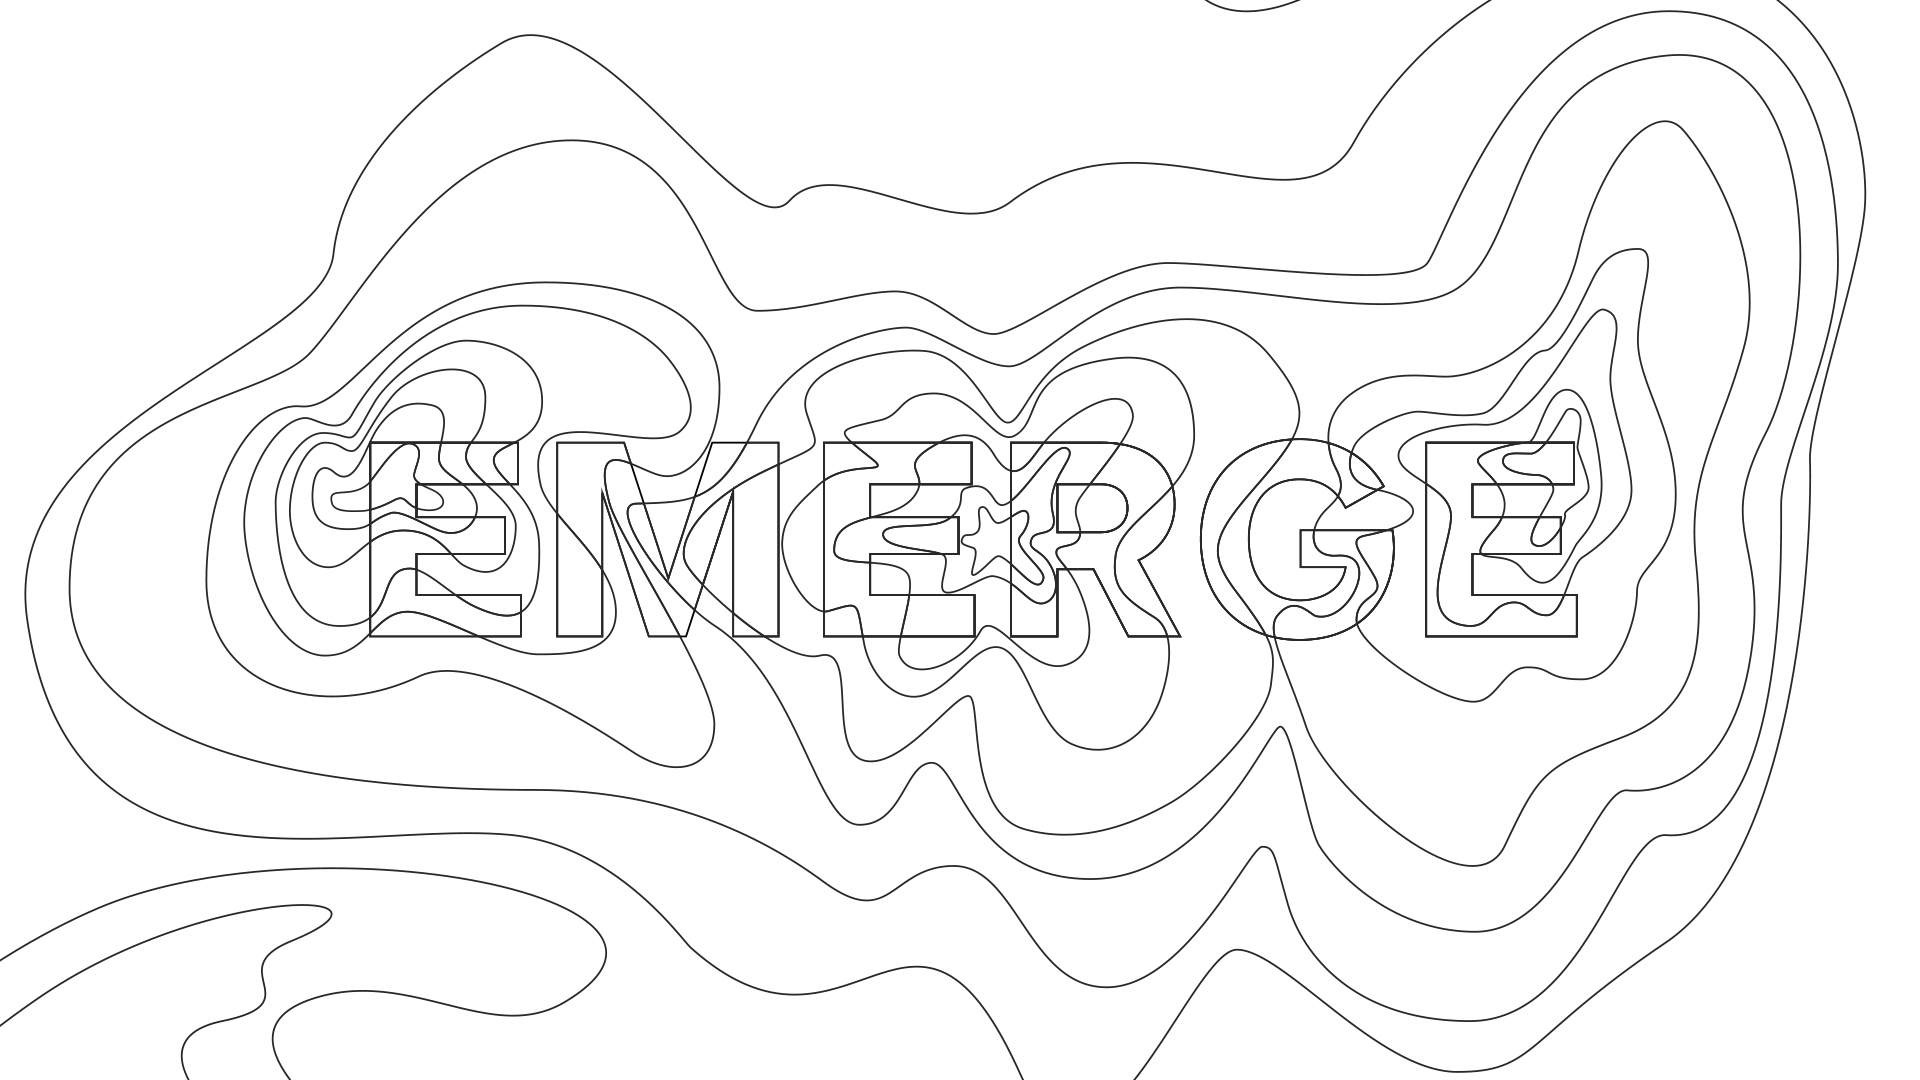 linework.jpg